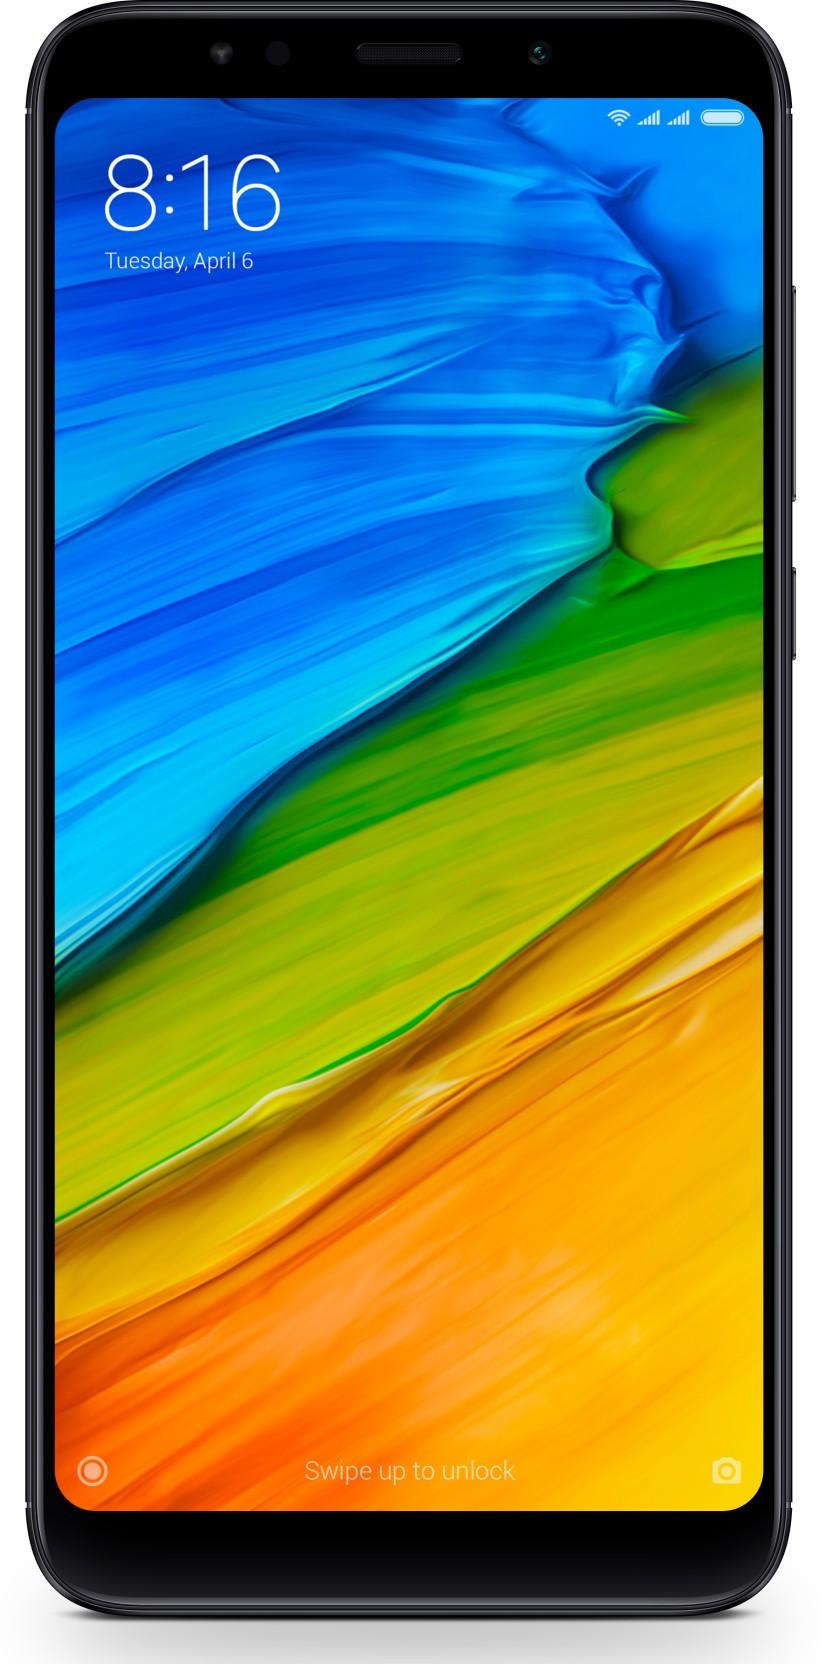 Harga Dan Spek Xiaomi Redmi Note 5 Pro 3gb Ram 32gb Internal Black Tas Anyaman Kulit Asli Chameo Couture Clucth Rafa Brown Cokelat Tua 32 Gb Online At Best Price Only On